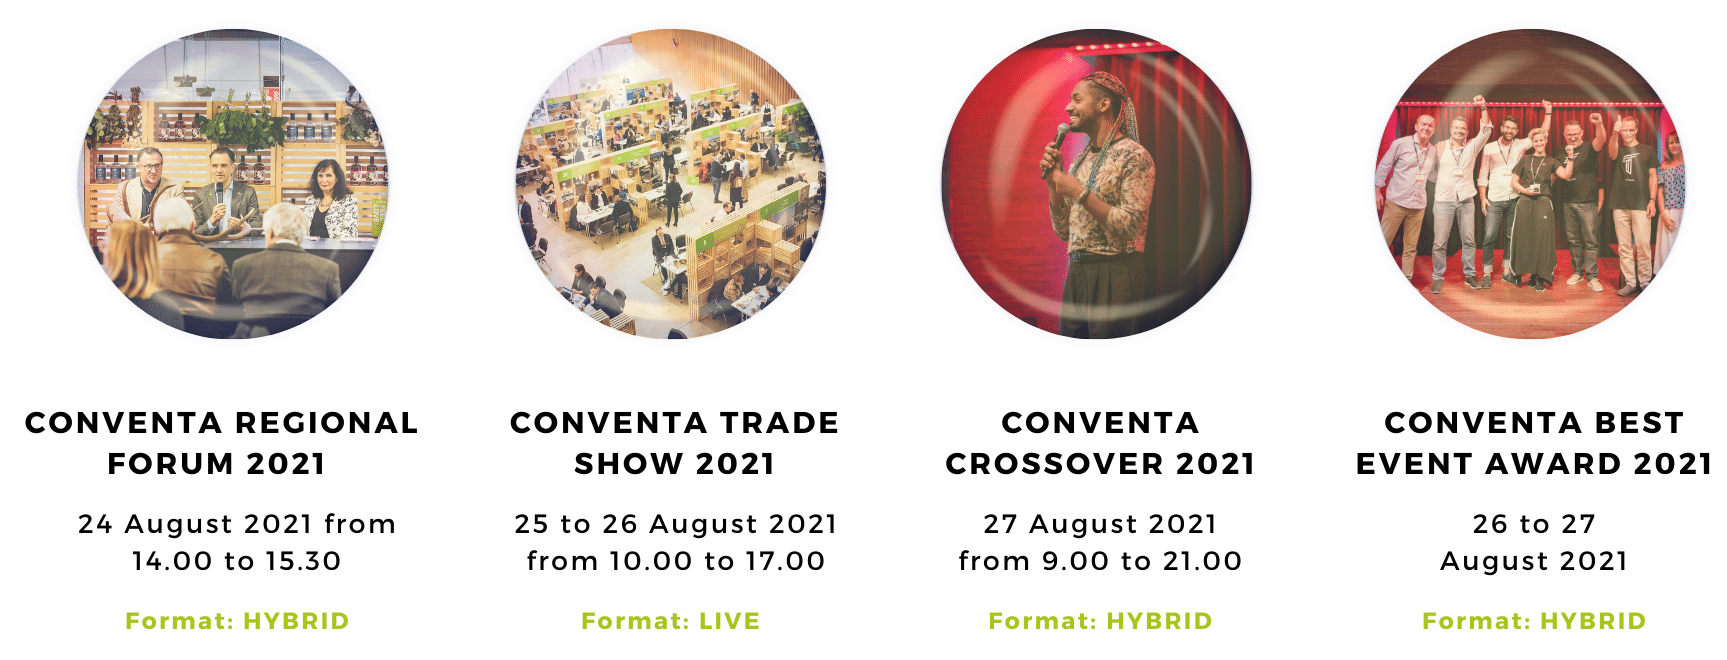 conventa-crossover-2021-hybrid-ac-bc